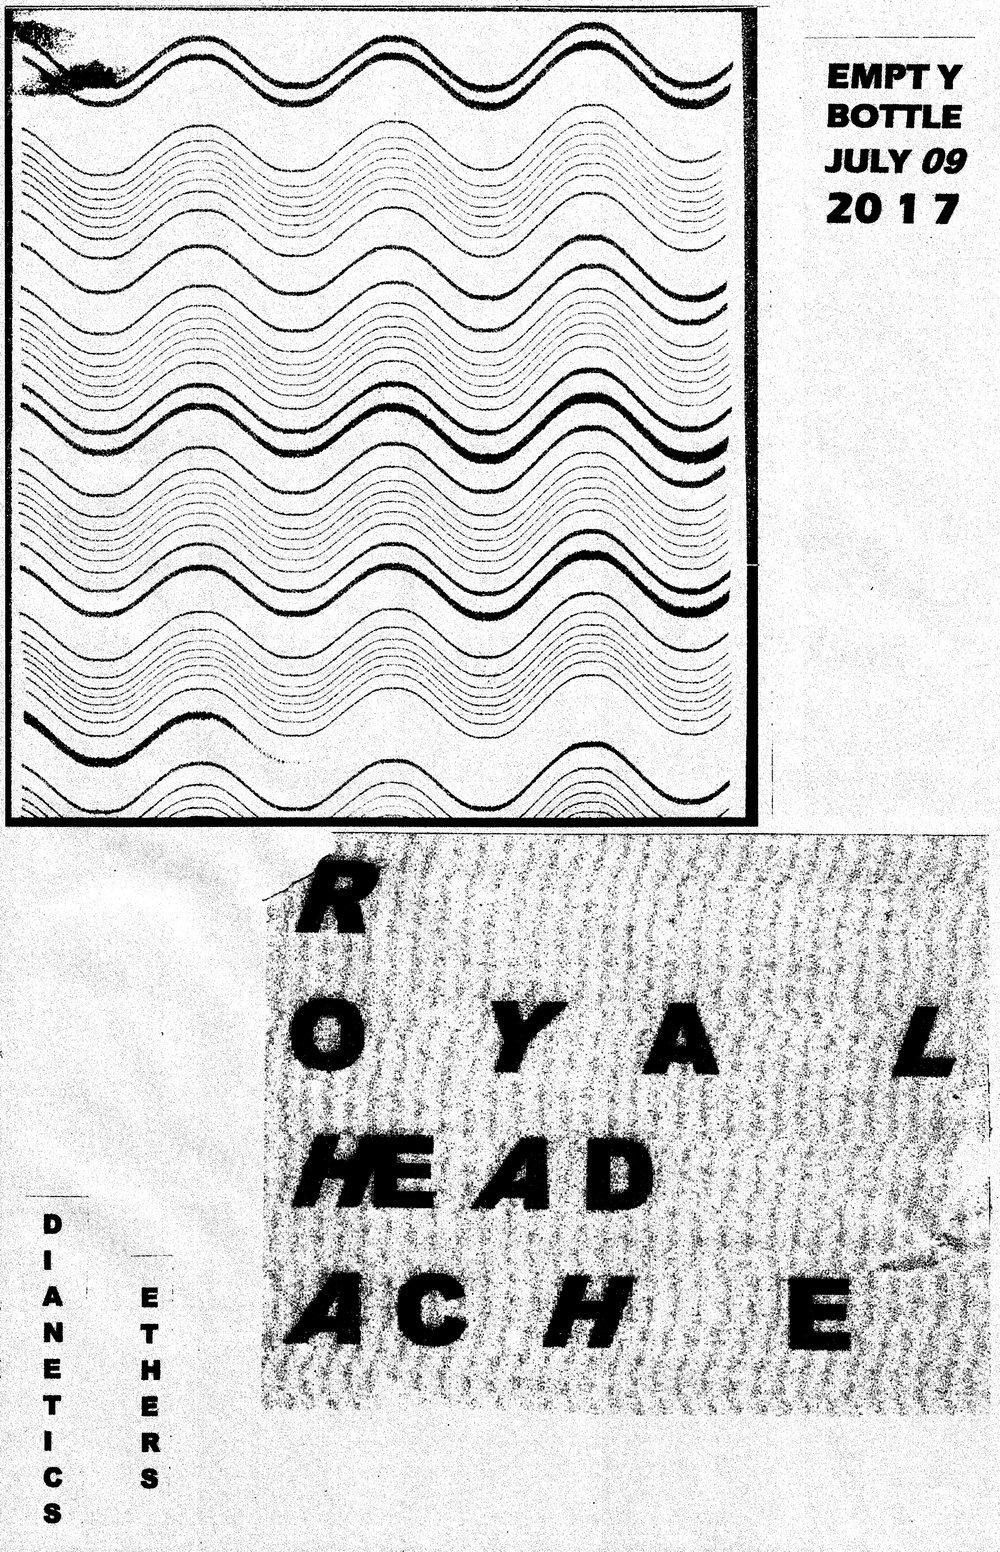 royalscanposterwht.jpg